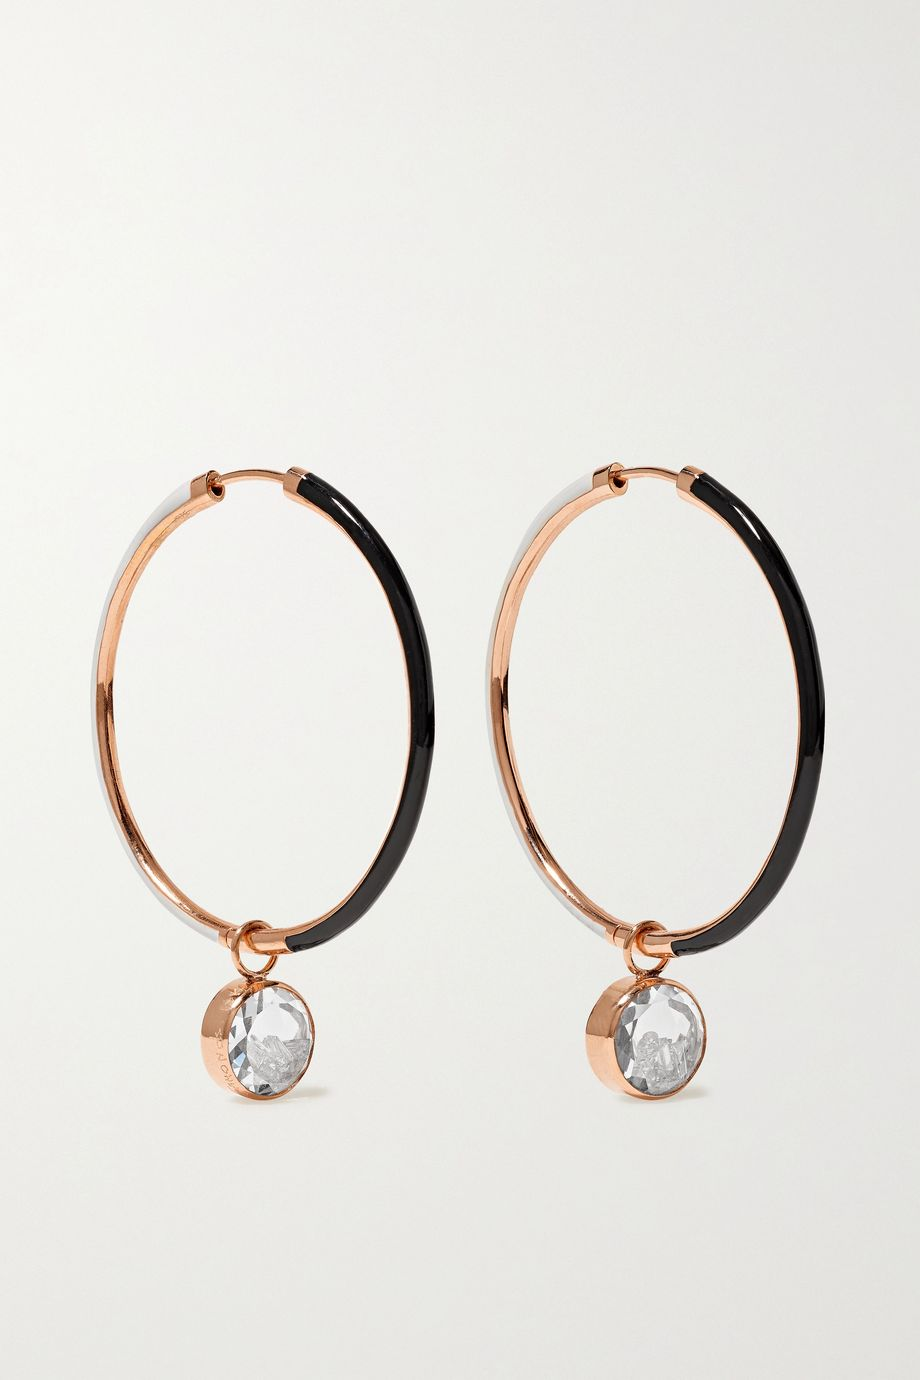 Moritz Glik 18-karat rose gold, enamel, sapphire crystal and diamond hoop earrings